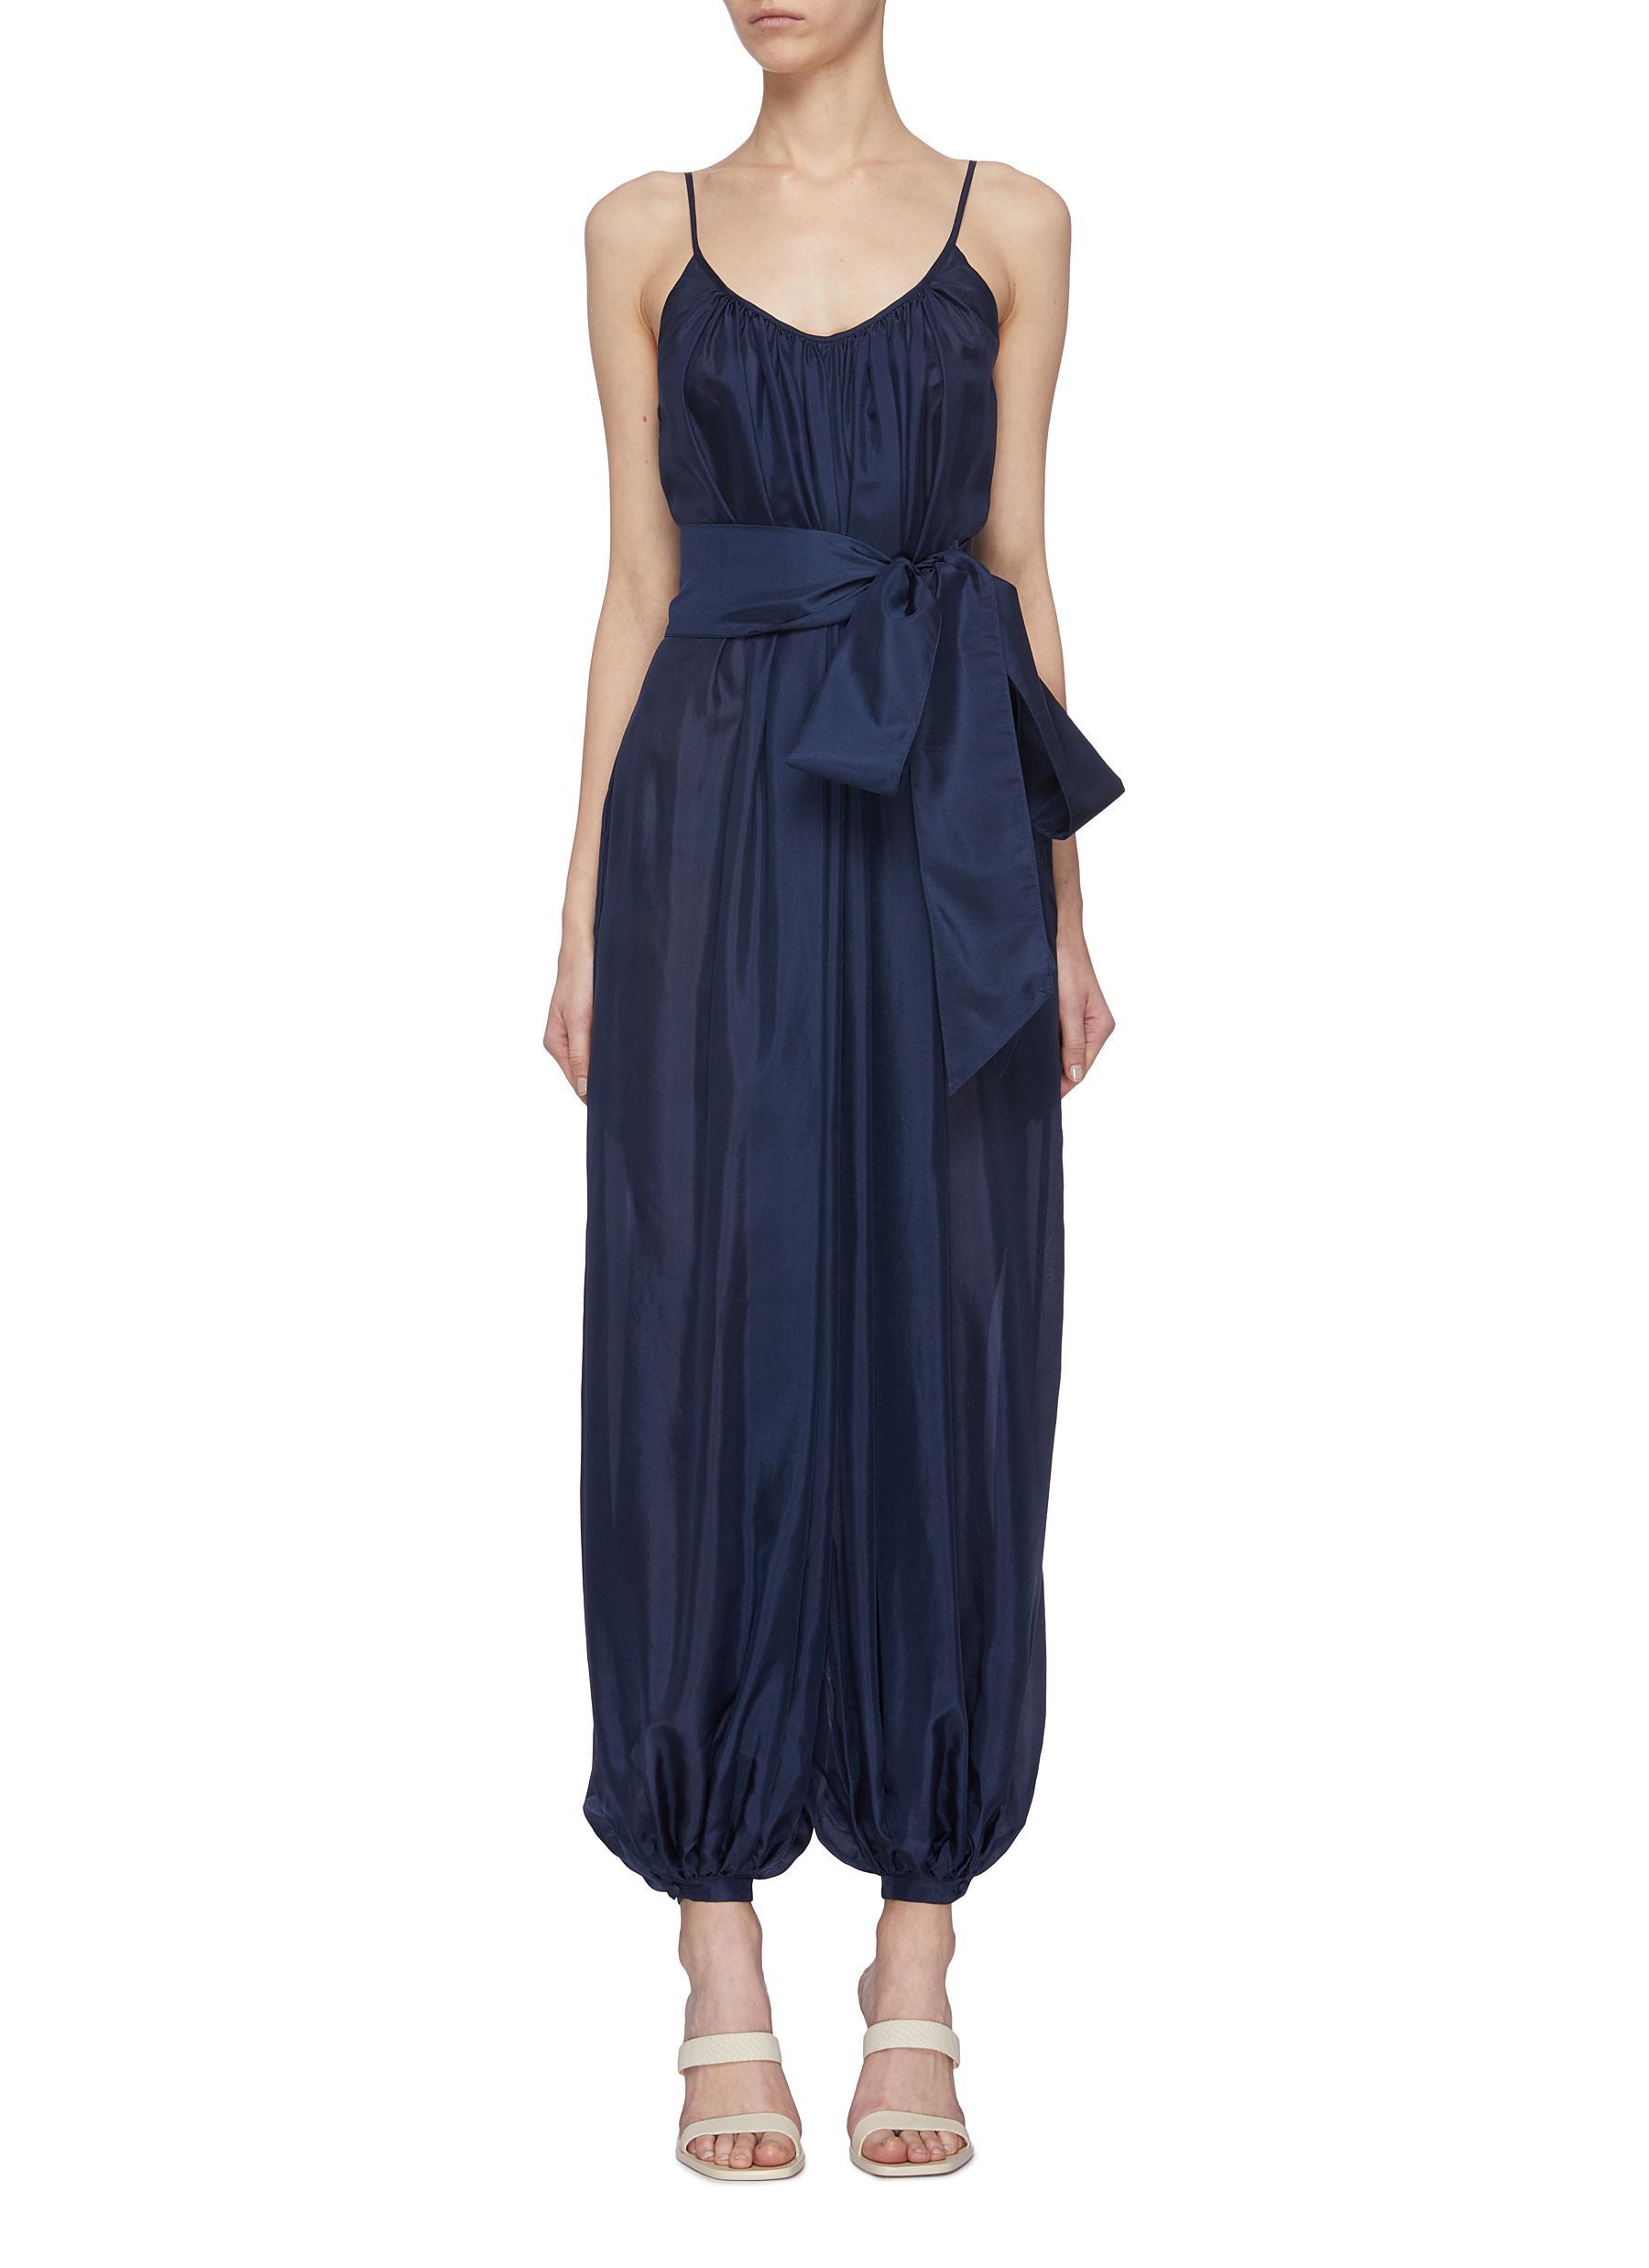 Buy Kalita Pants & Shorts 'Balloon' belted jumpsuit